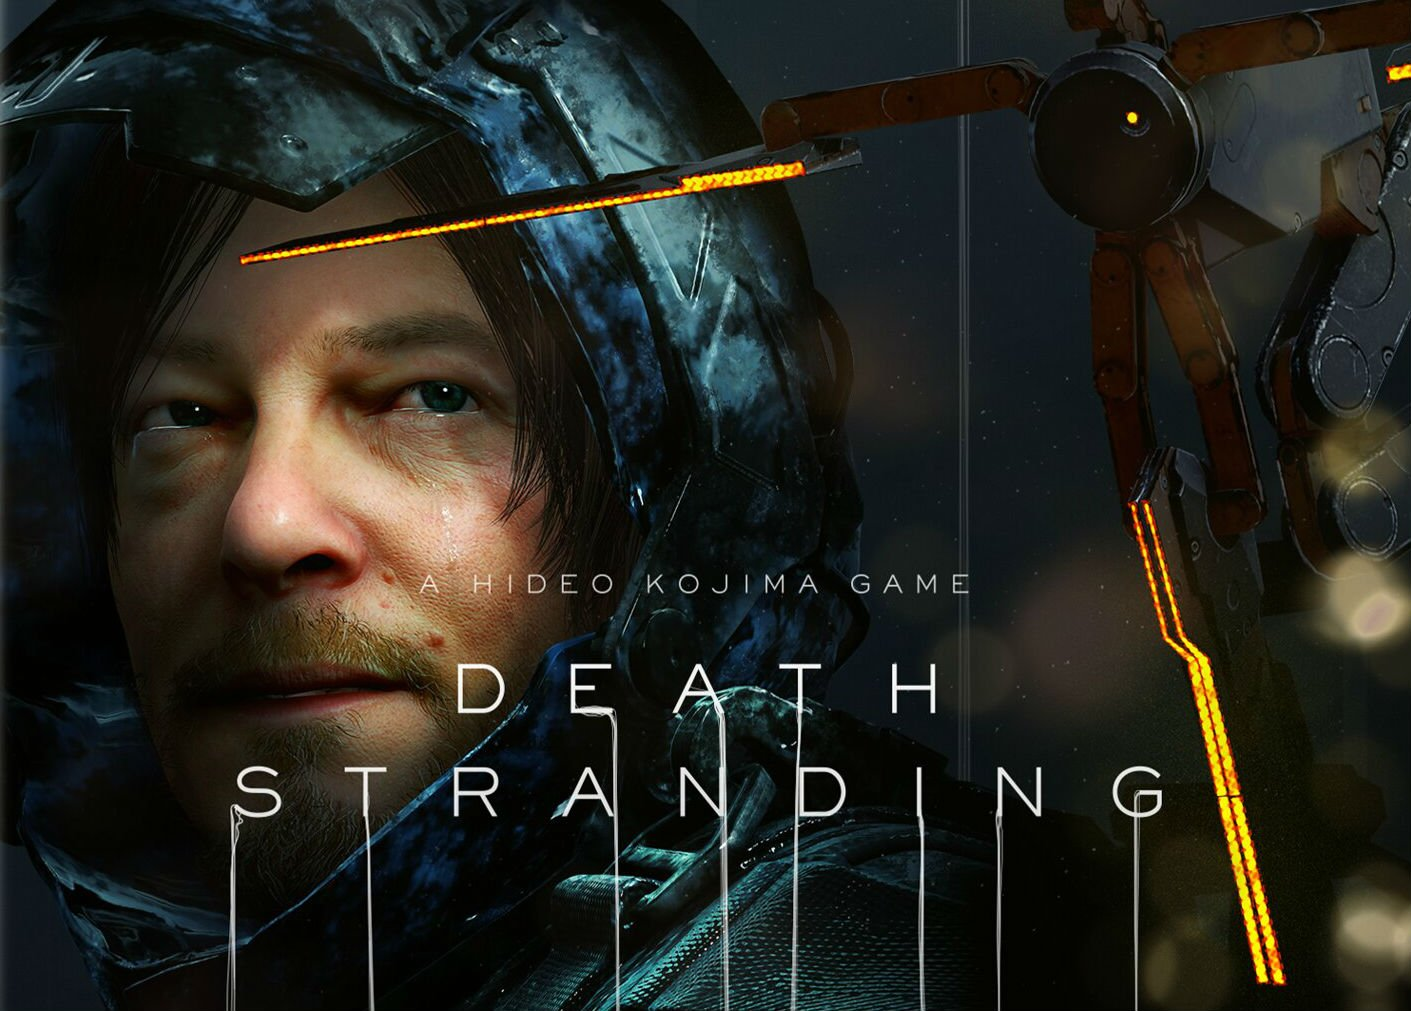 Death Stranding's box art keeps the Kojima/Norman Reedus bromance alive